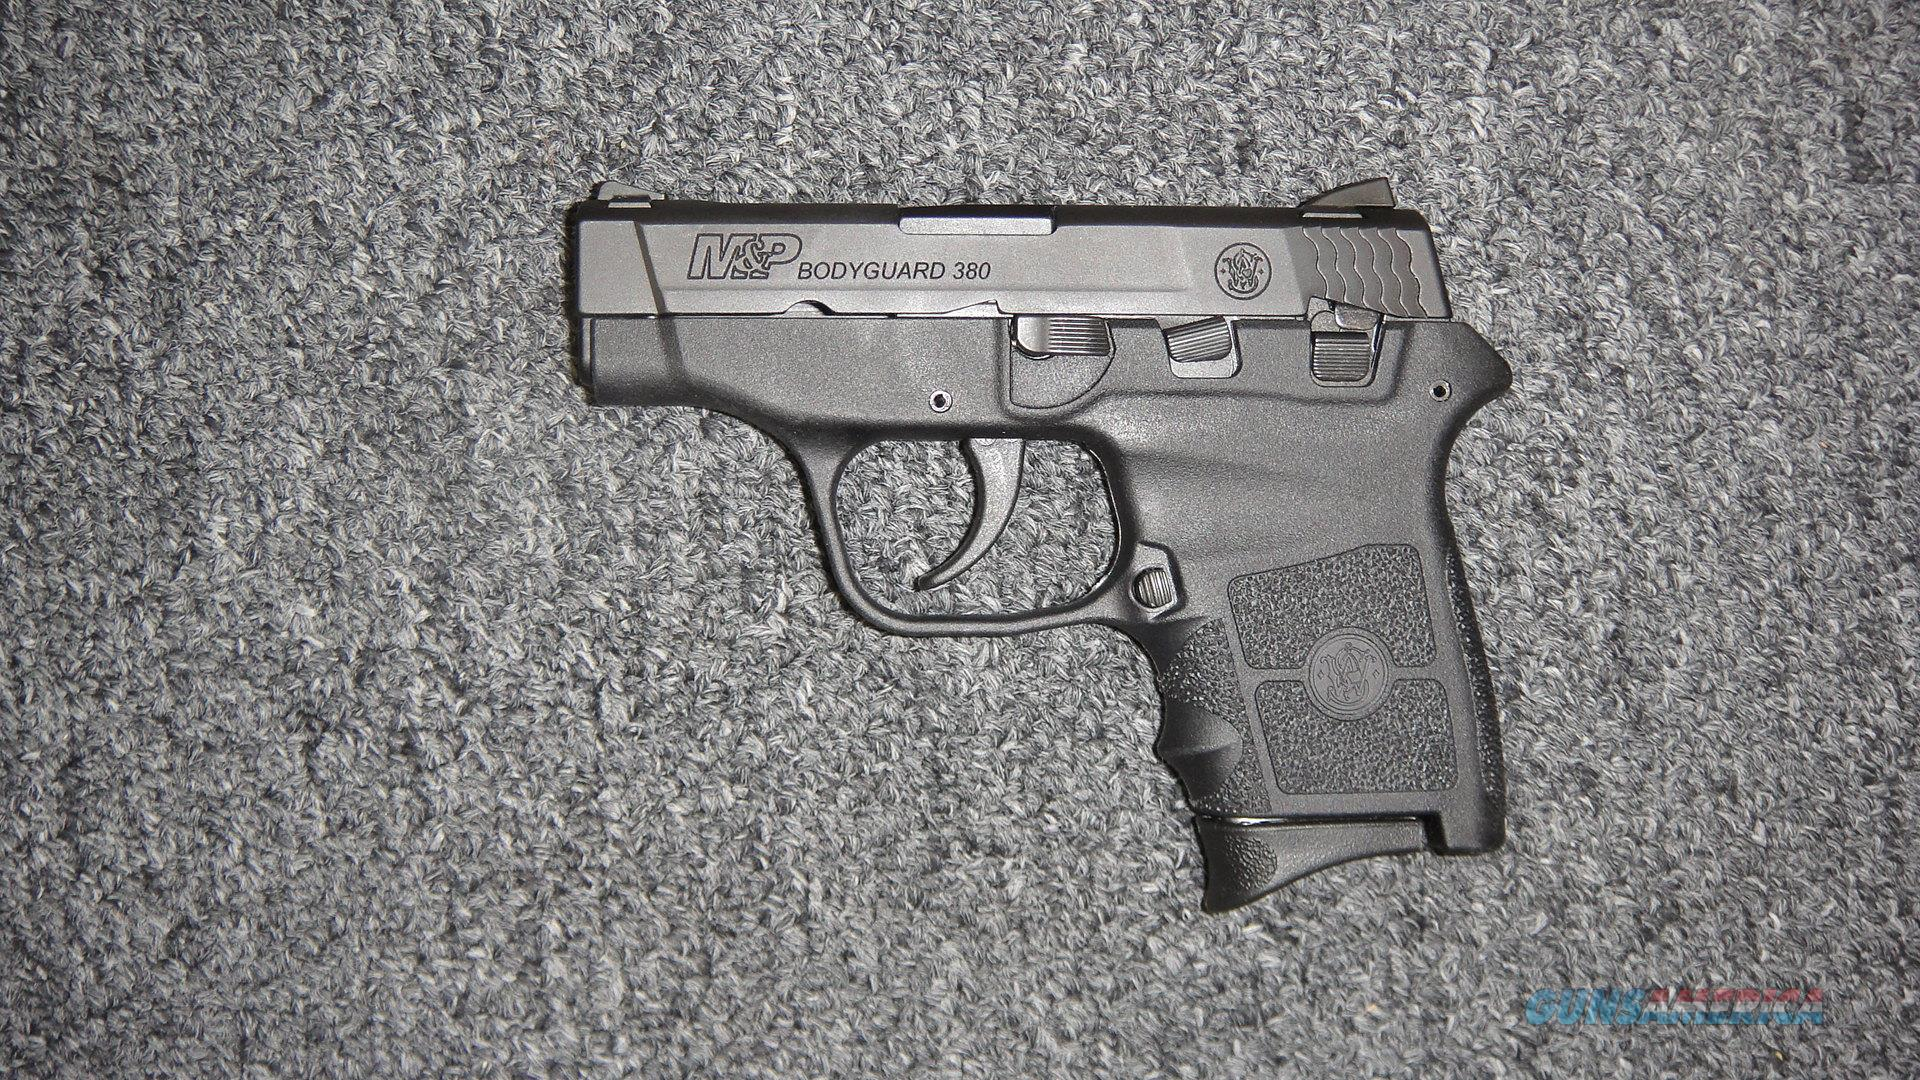 Smith & Wesson M&P Bodyguard 380   Guns > Pistols > Smith & Wesson Pistols - Autos > Polymer Frame